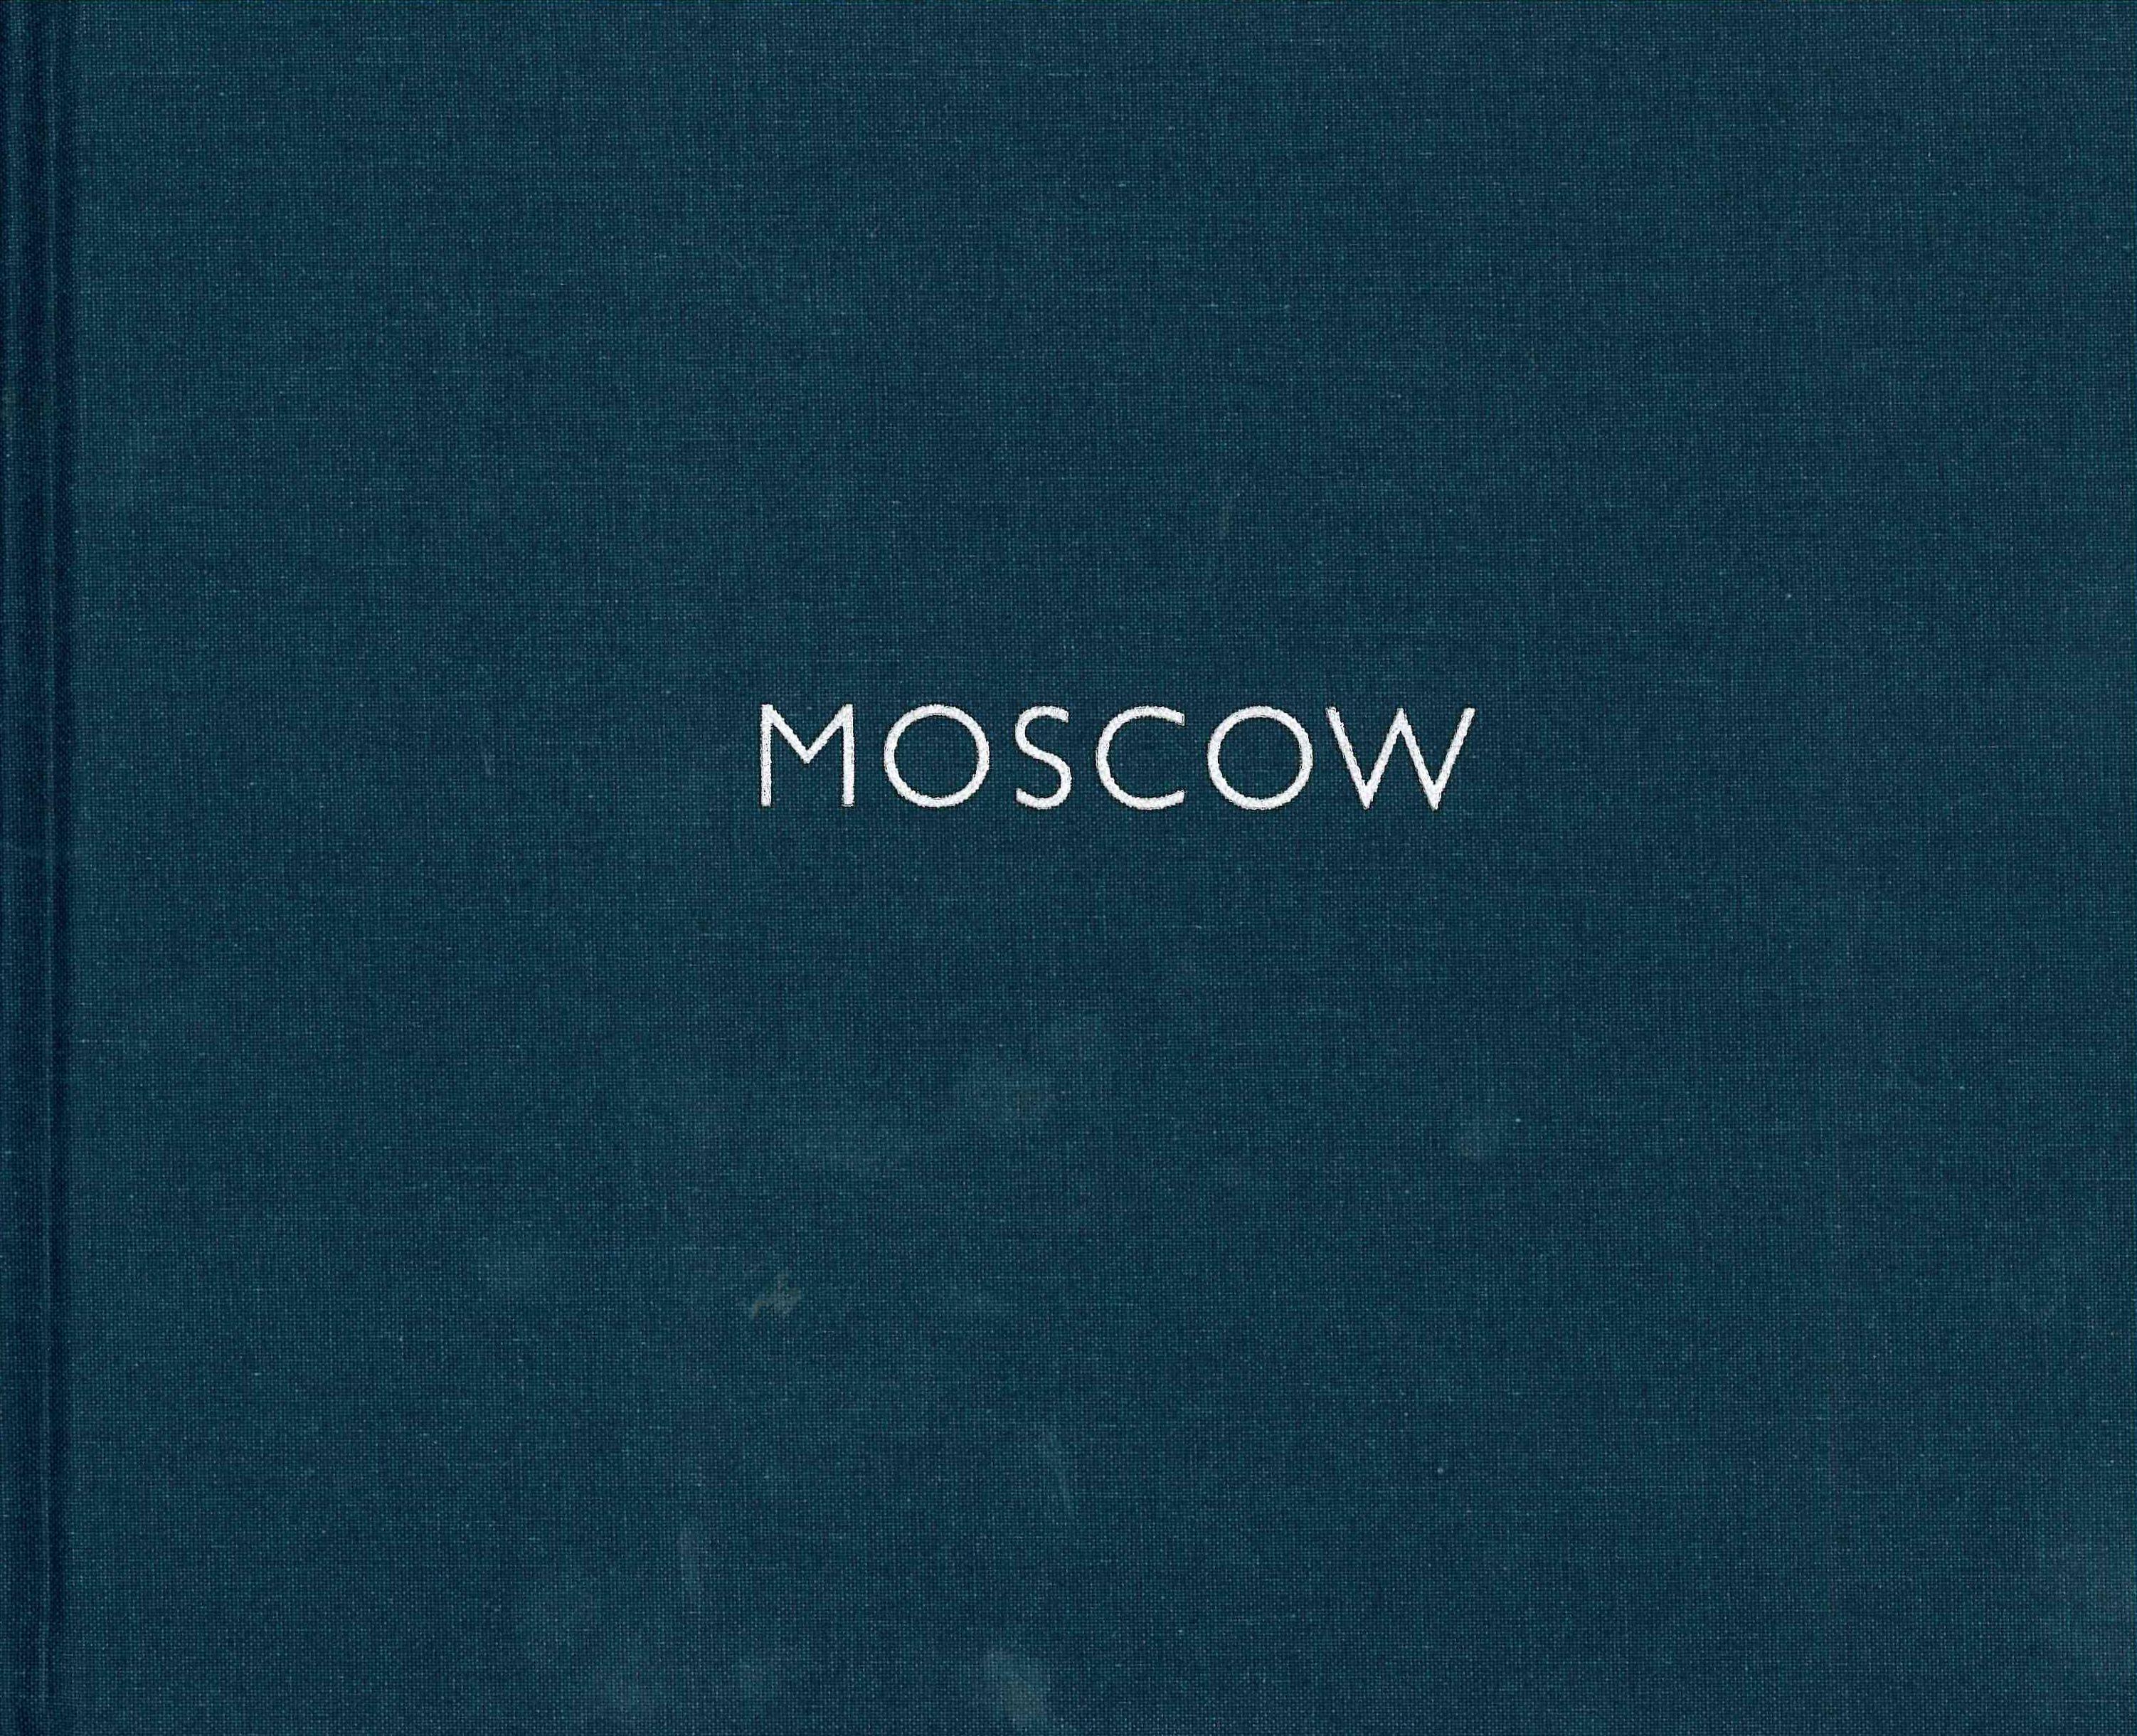 Moscow | Yevgeniy Fiks | Ugly Duckling Presse